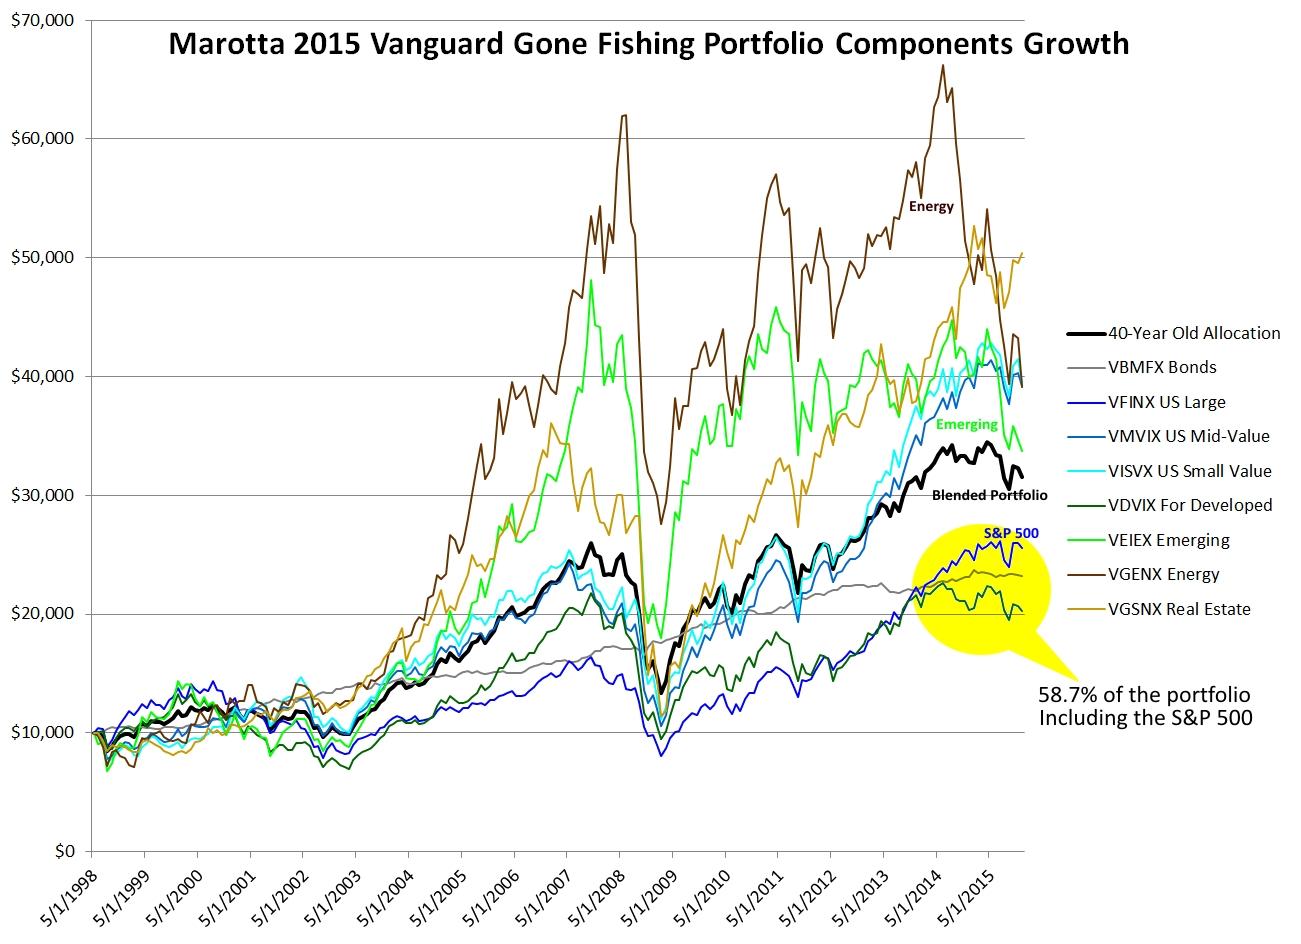 Vanguard Gone Fishing 2015 Growth